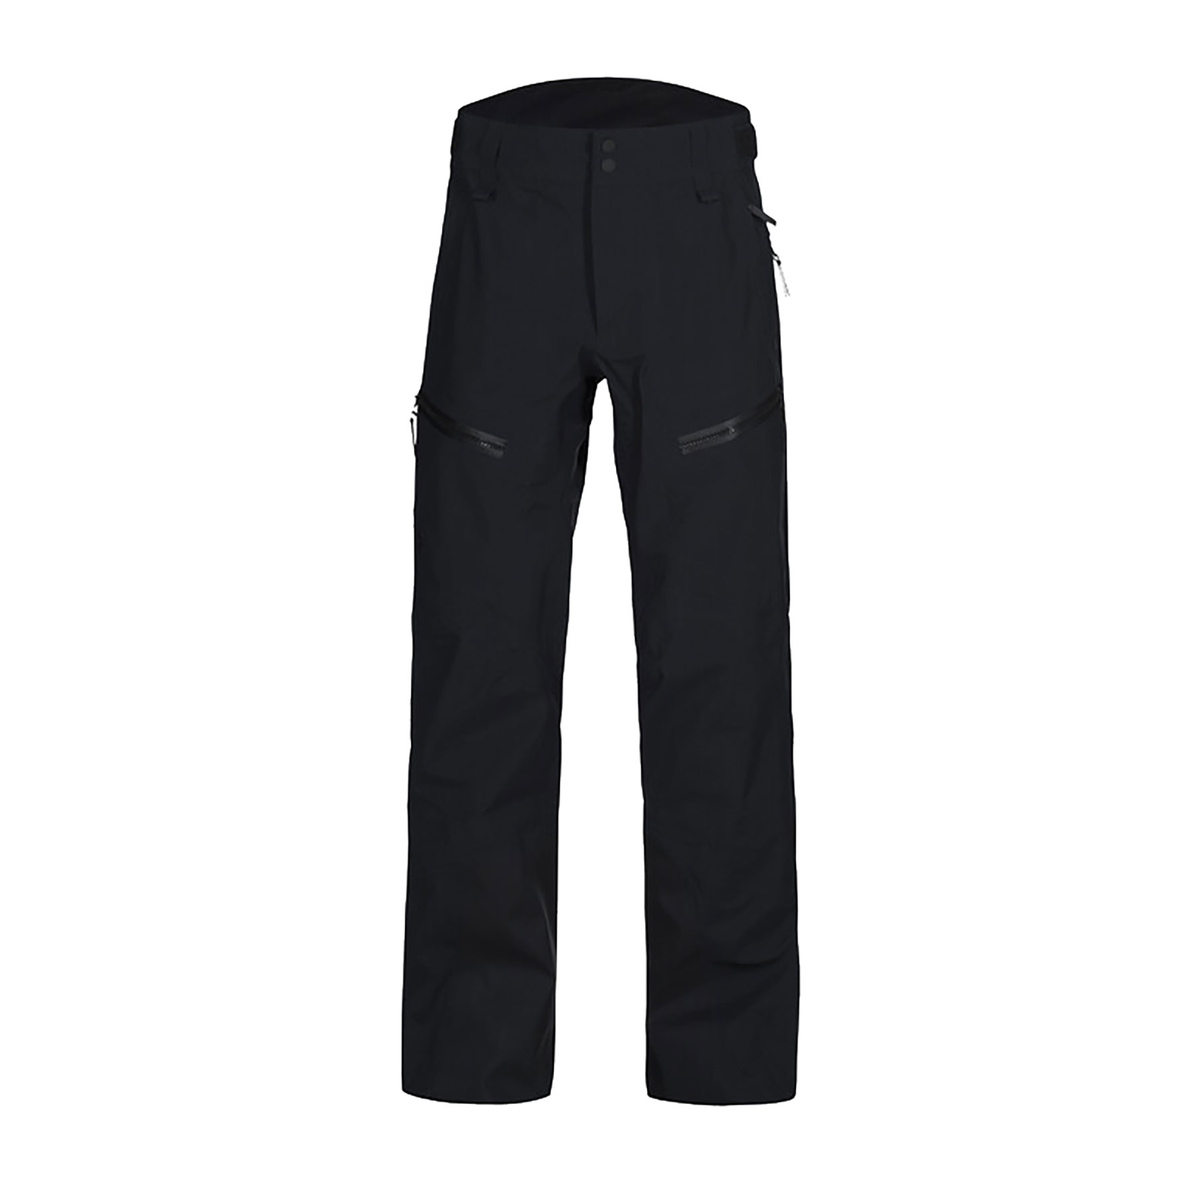 Prezzi Peak performance pantaloni GRAVITY GORE-TEX